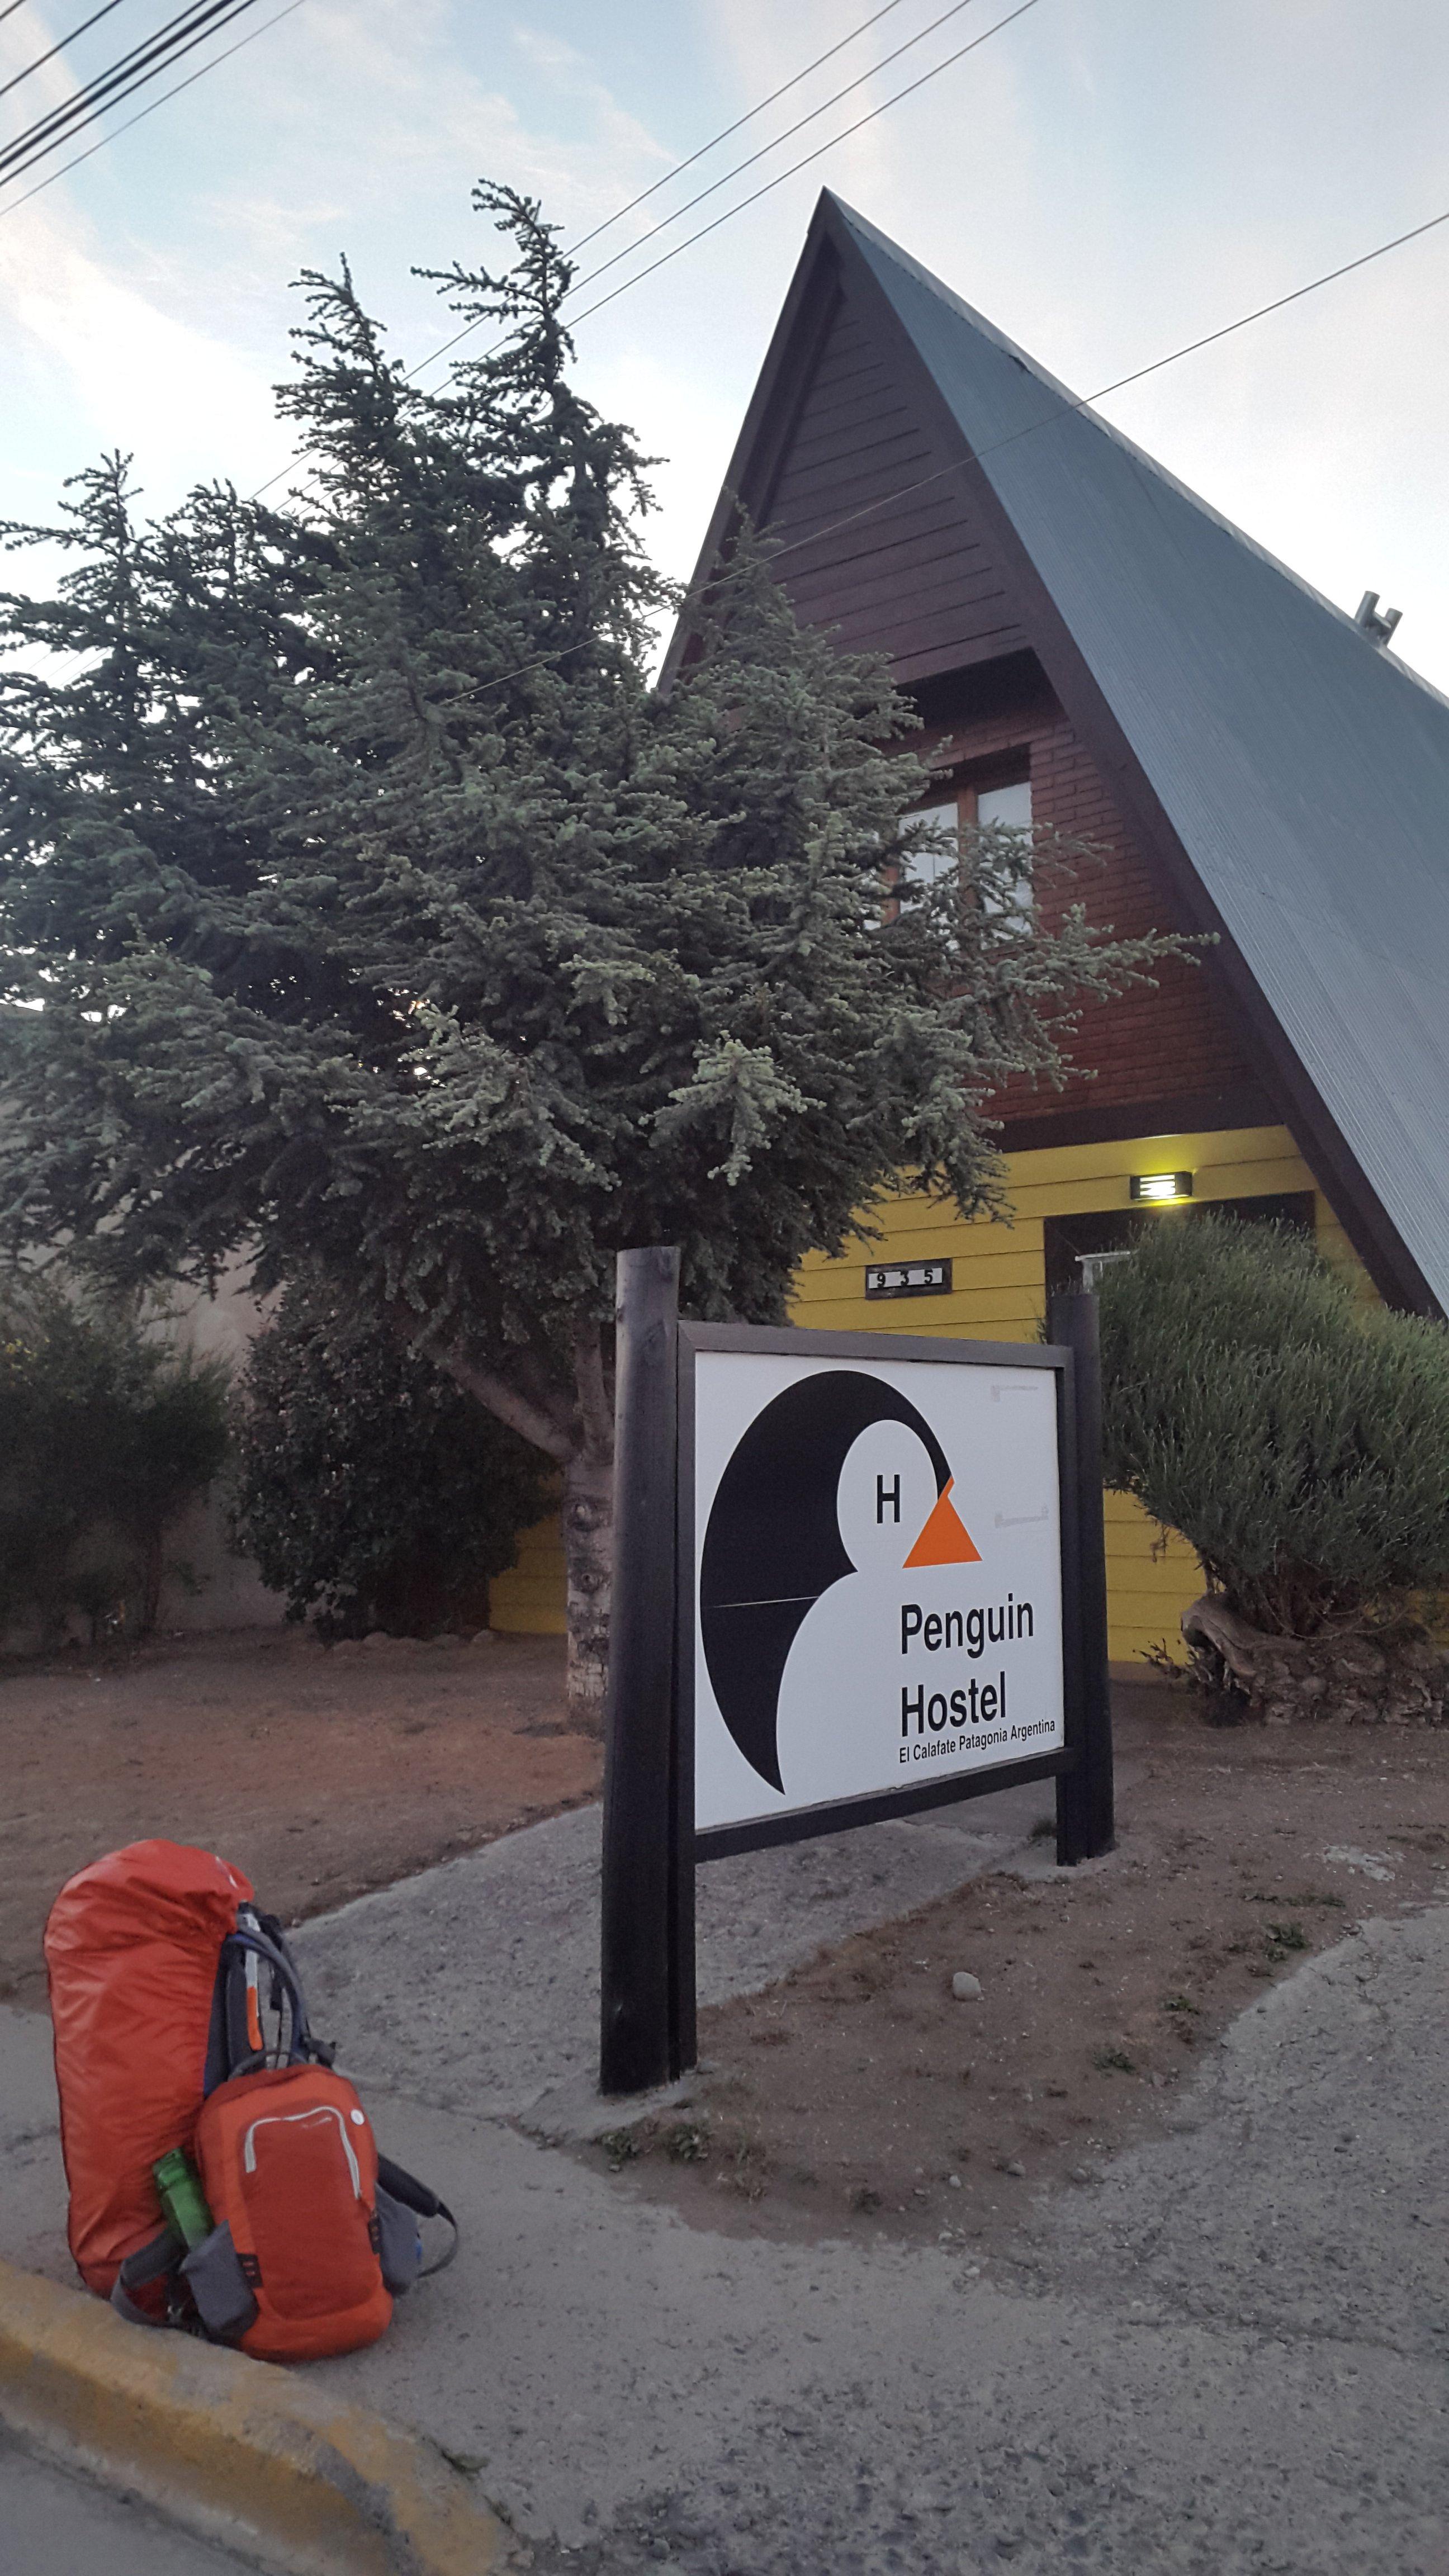 Penguin Hostel, El Calafate